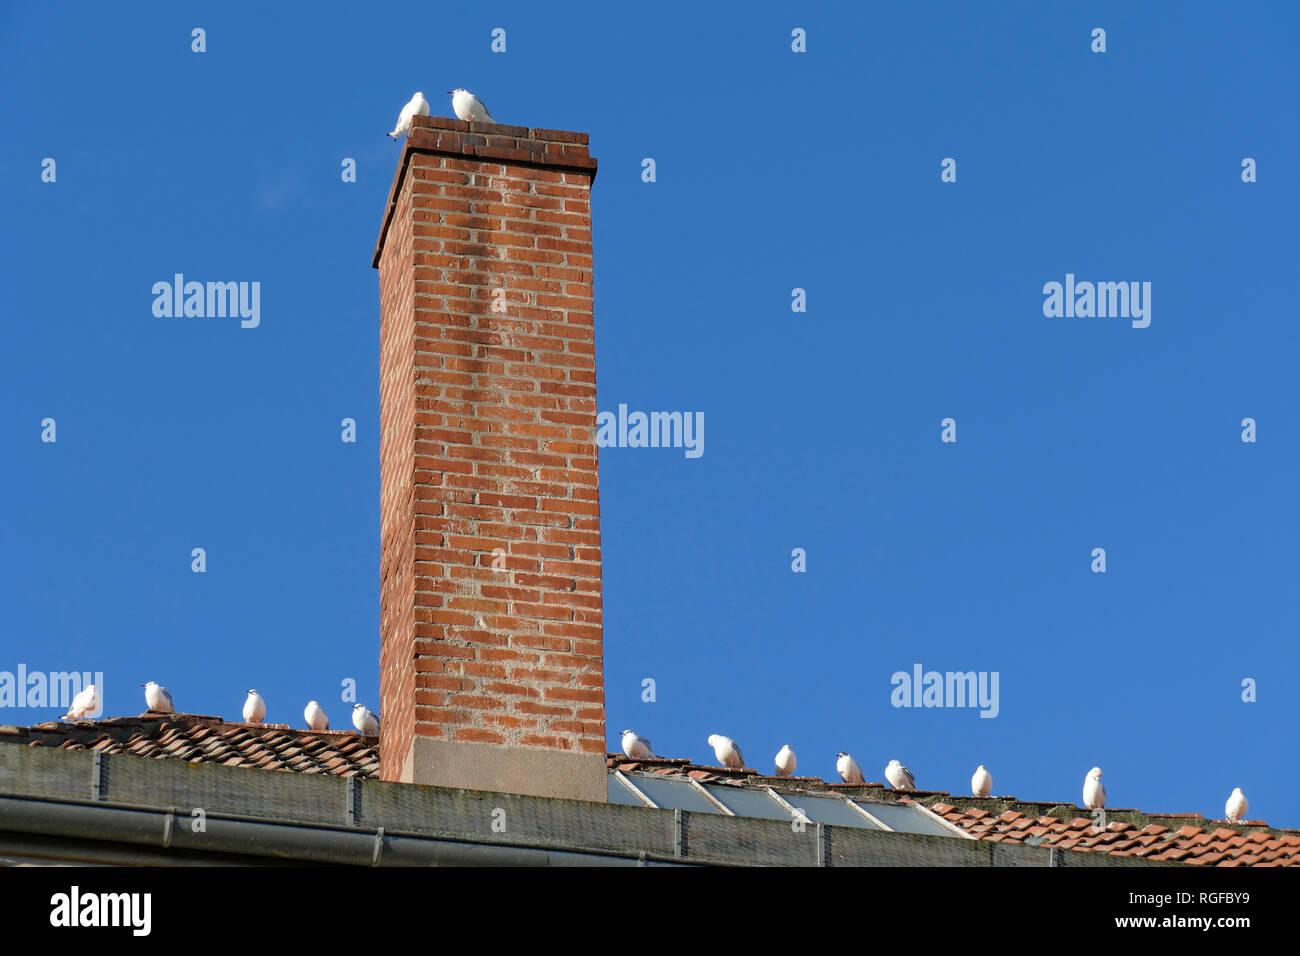 Roof, brick chimney, standing seagulls - Stock Image